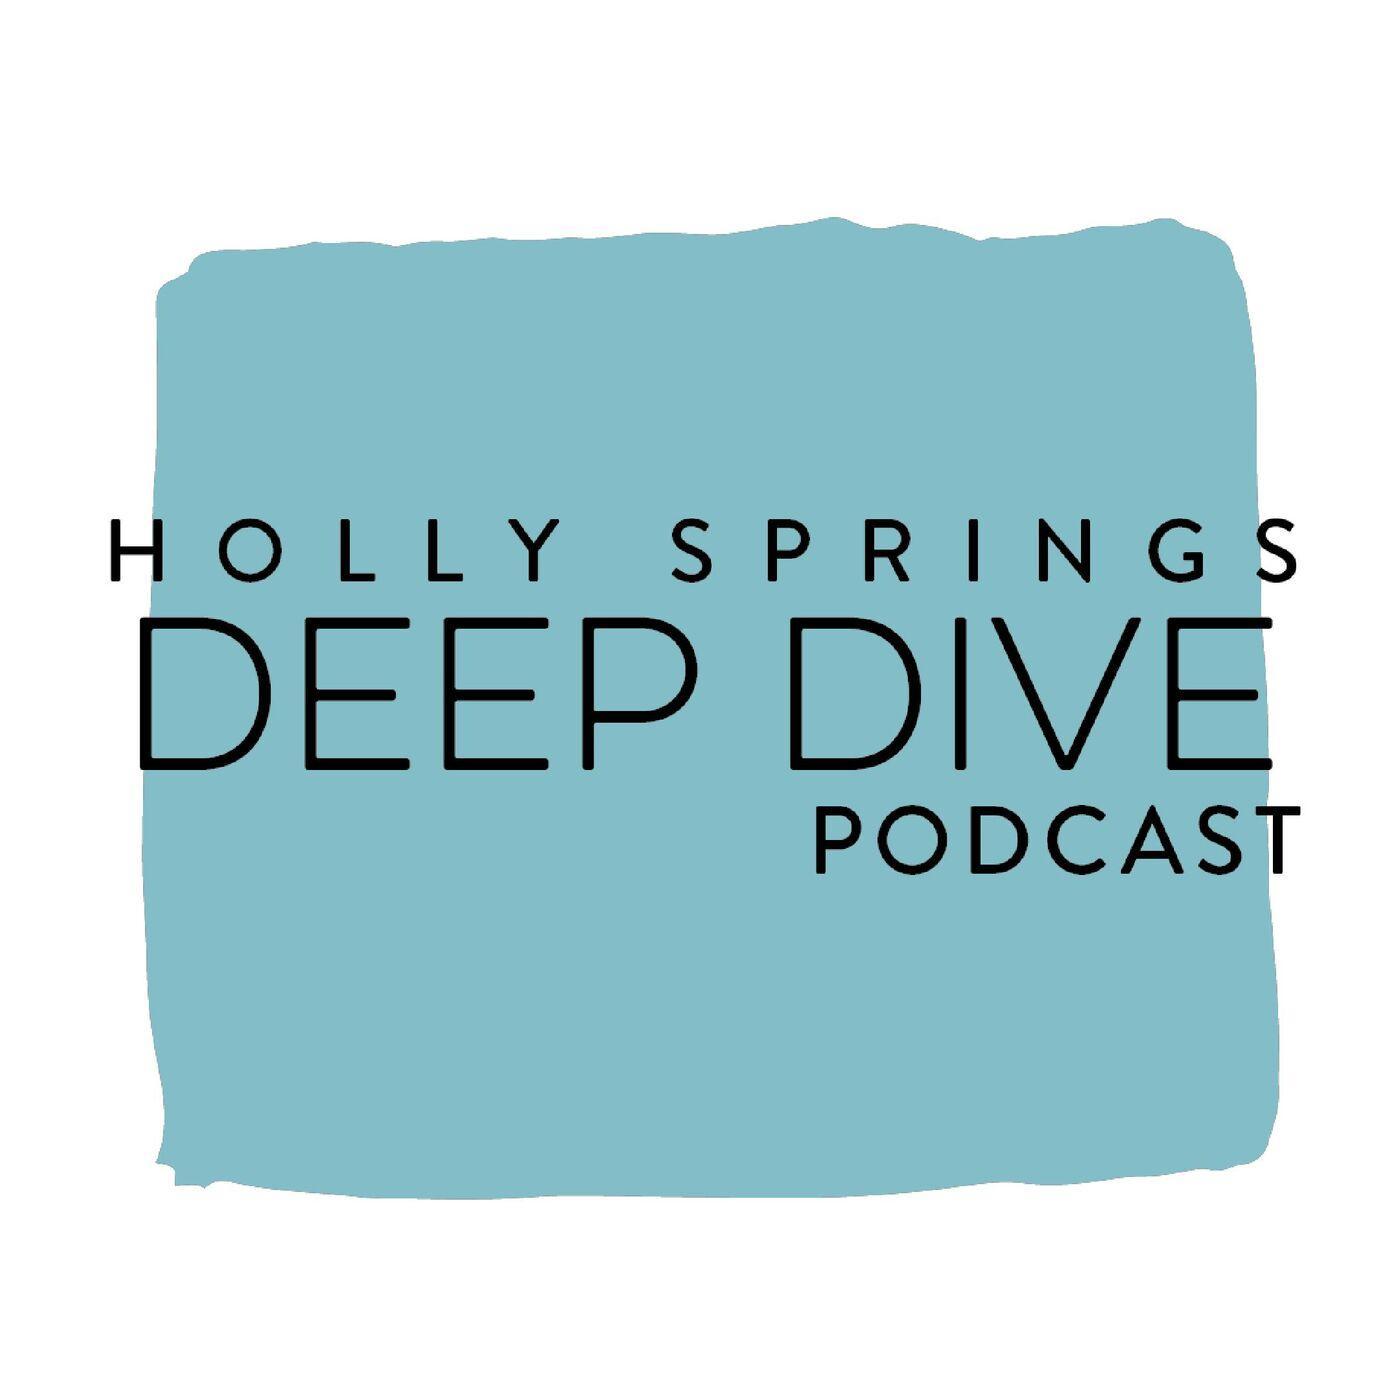 Wondrous Holly Springs Deep Dive Podcast Karen Shore Listen Notes Pabps2019 Chair Design Images Pabps2019Com